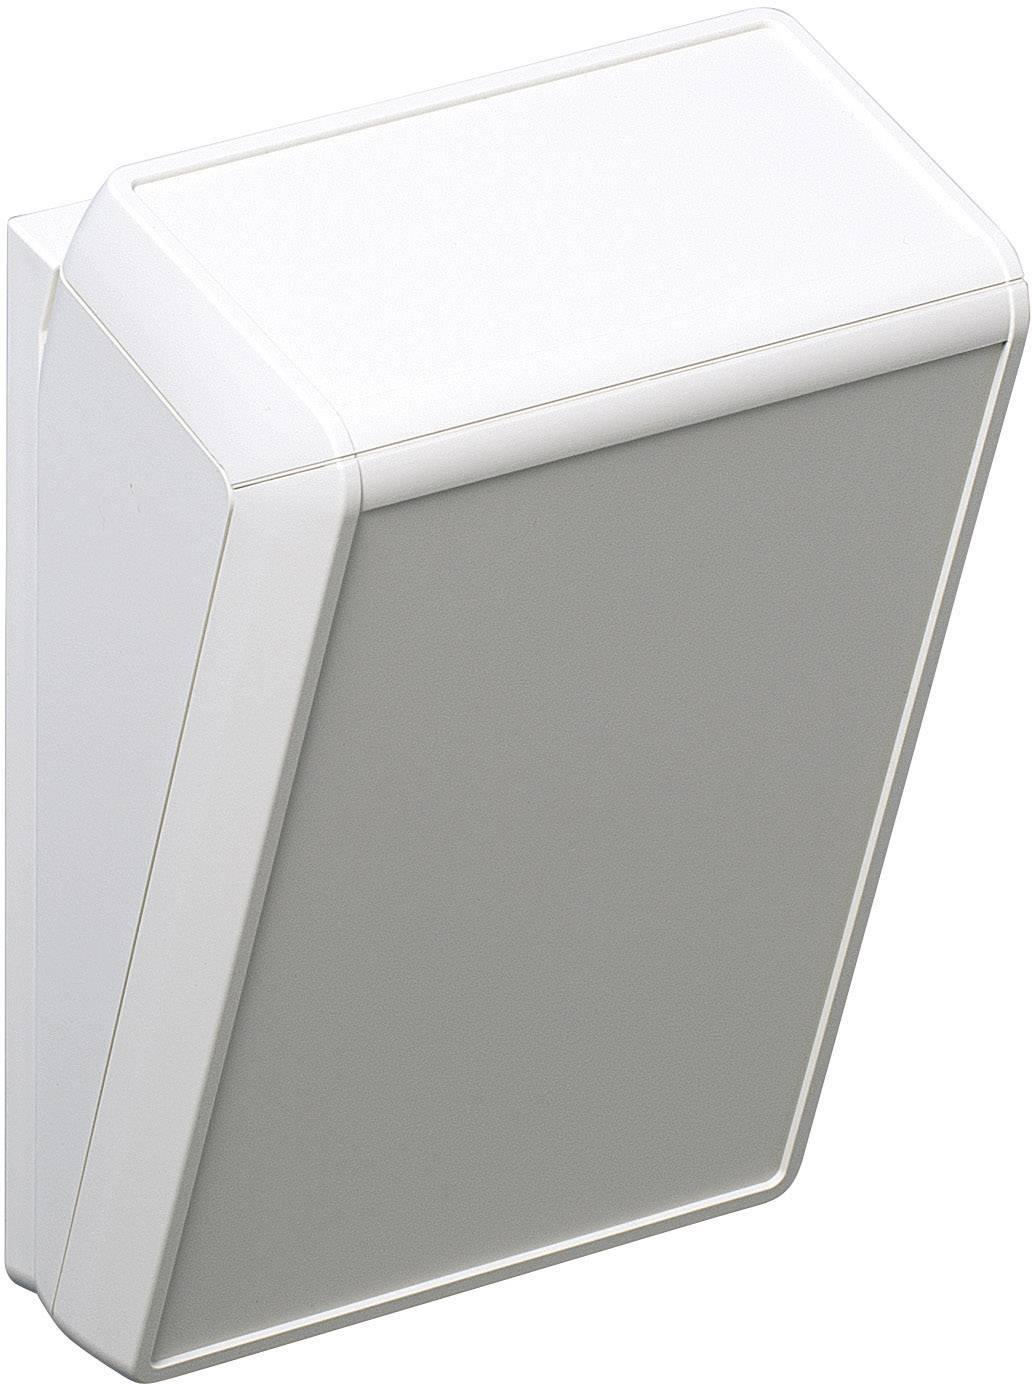 Skrinka na ovládací pult OKW UNITEC D4056117, 148 x 210 x 90 mm, ABS, sivobiela, 1 ks